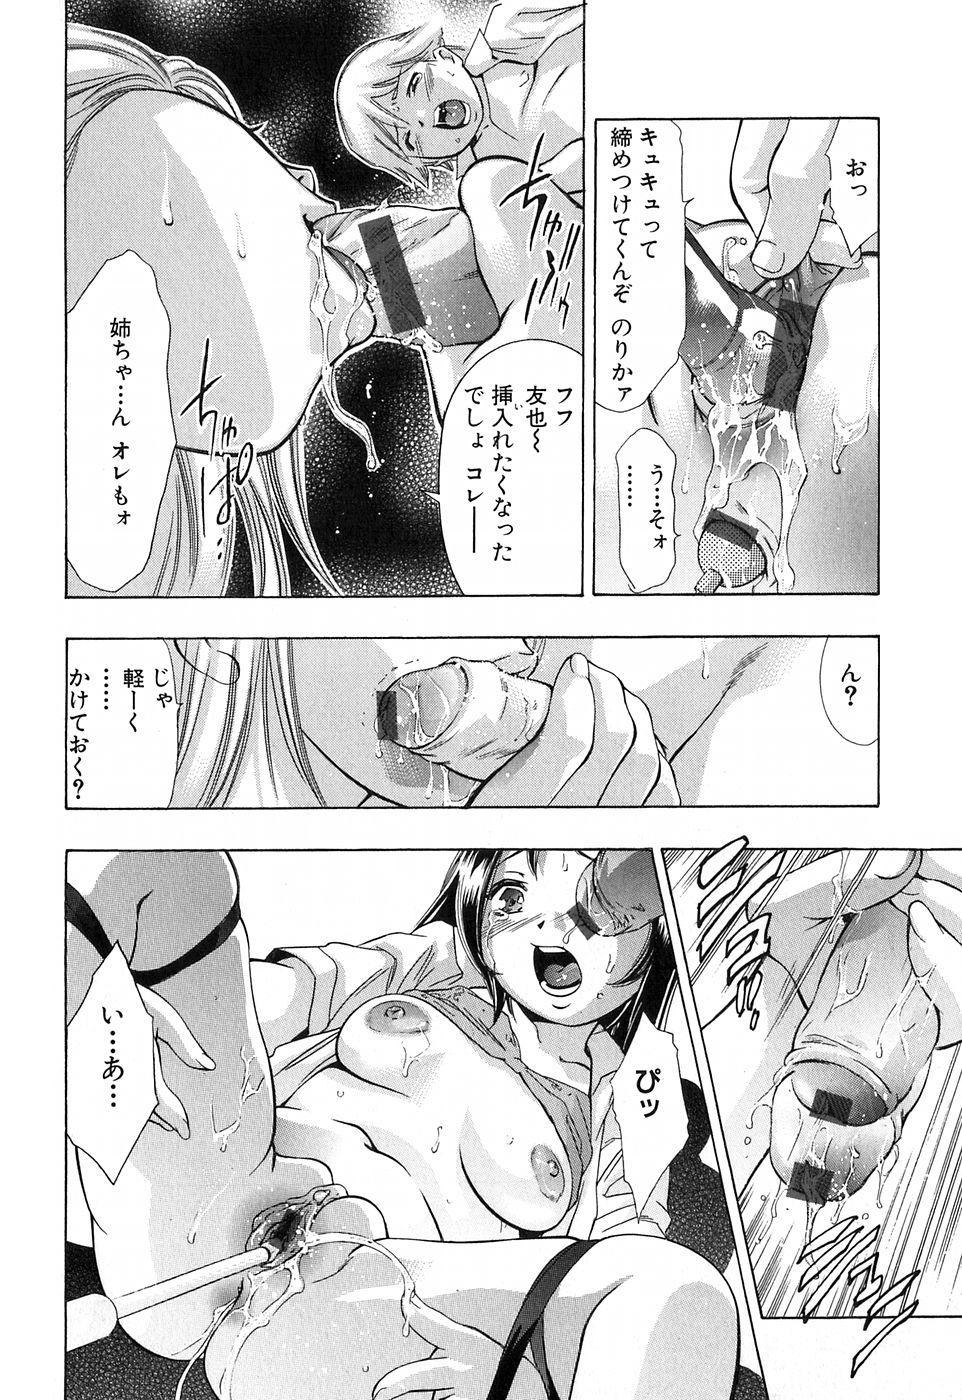 Uchi Naru Koe - Voice which becomes inside 161